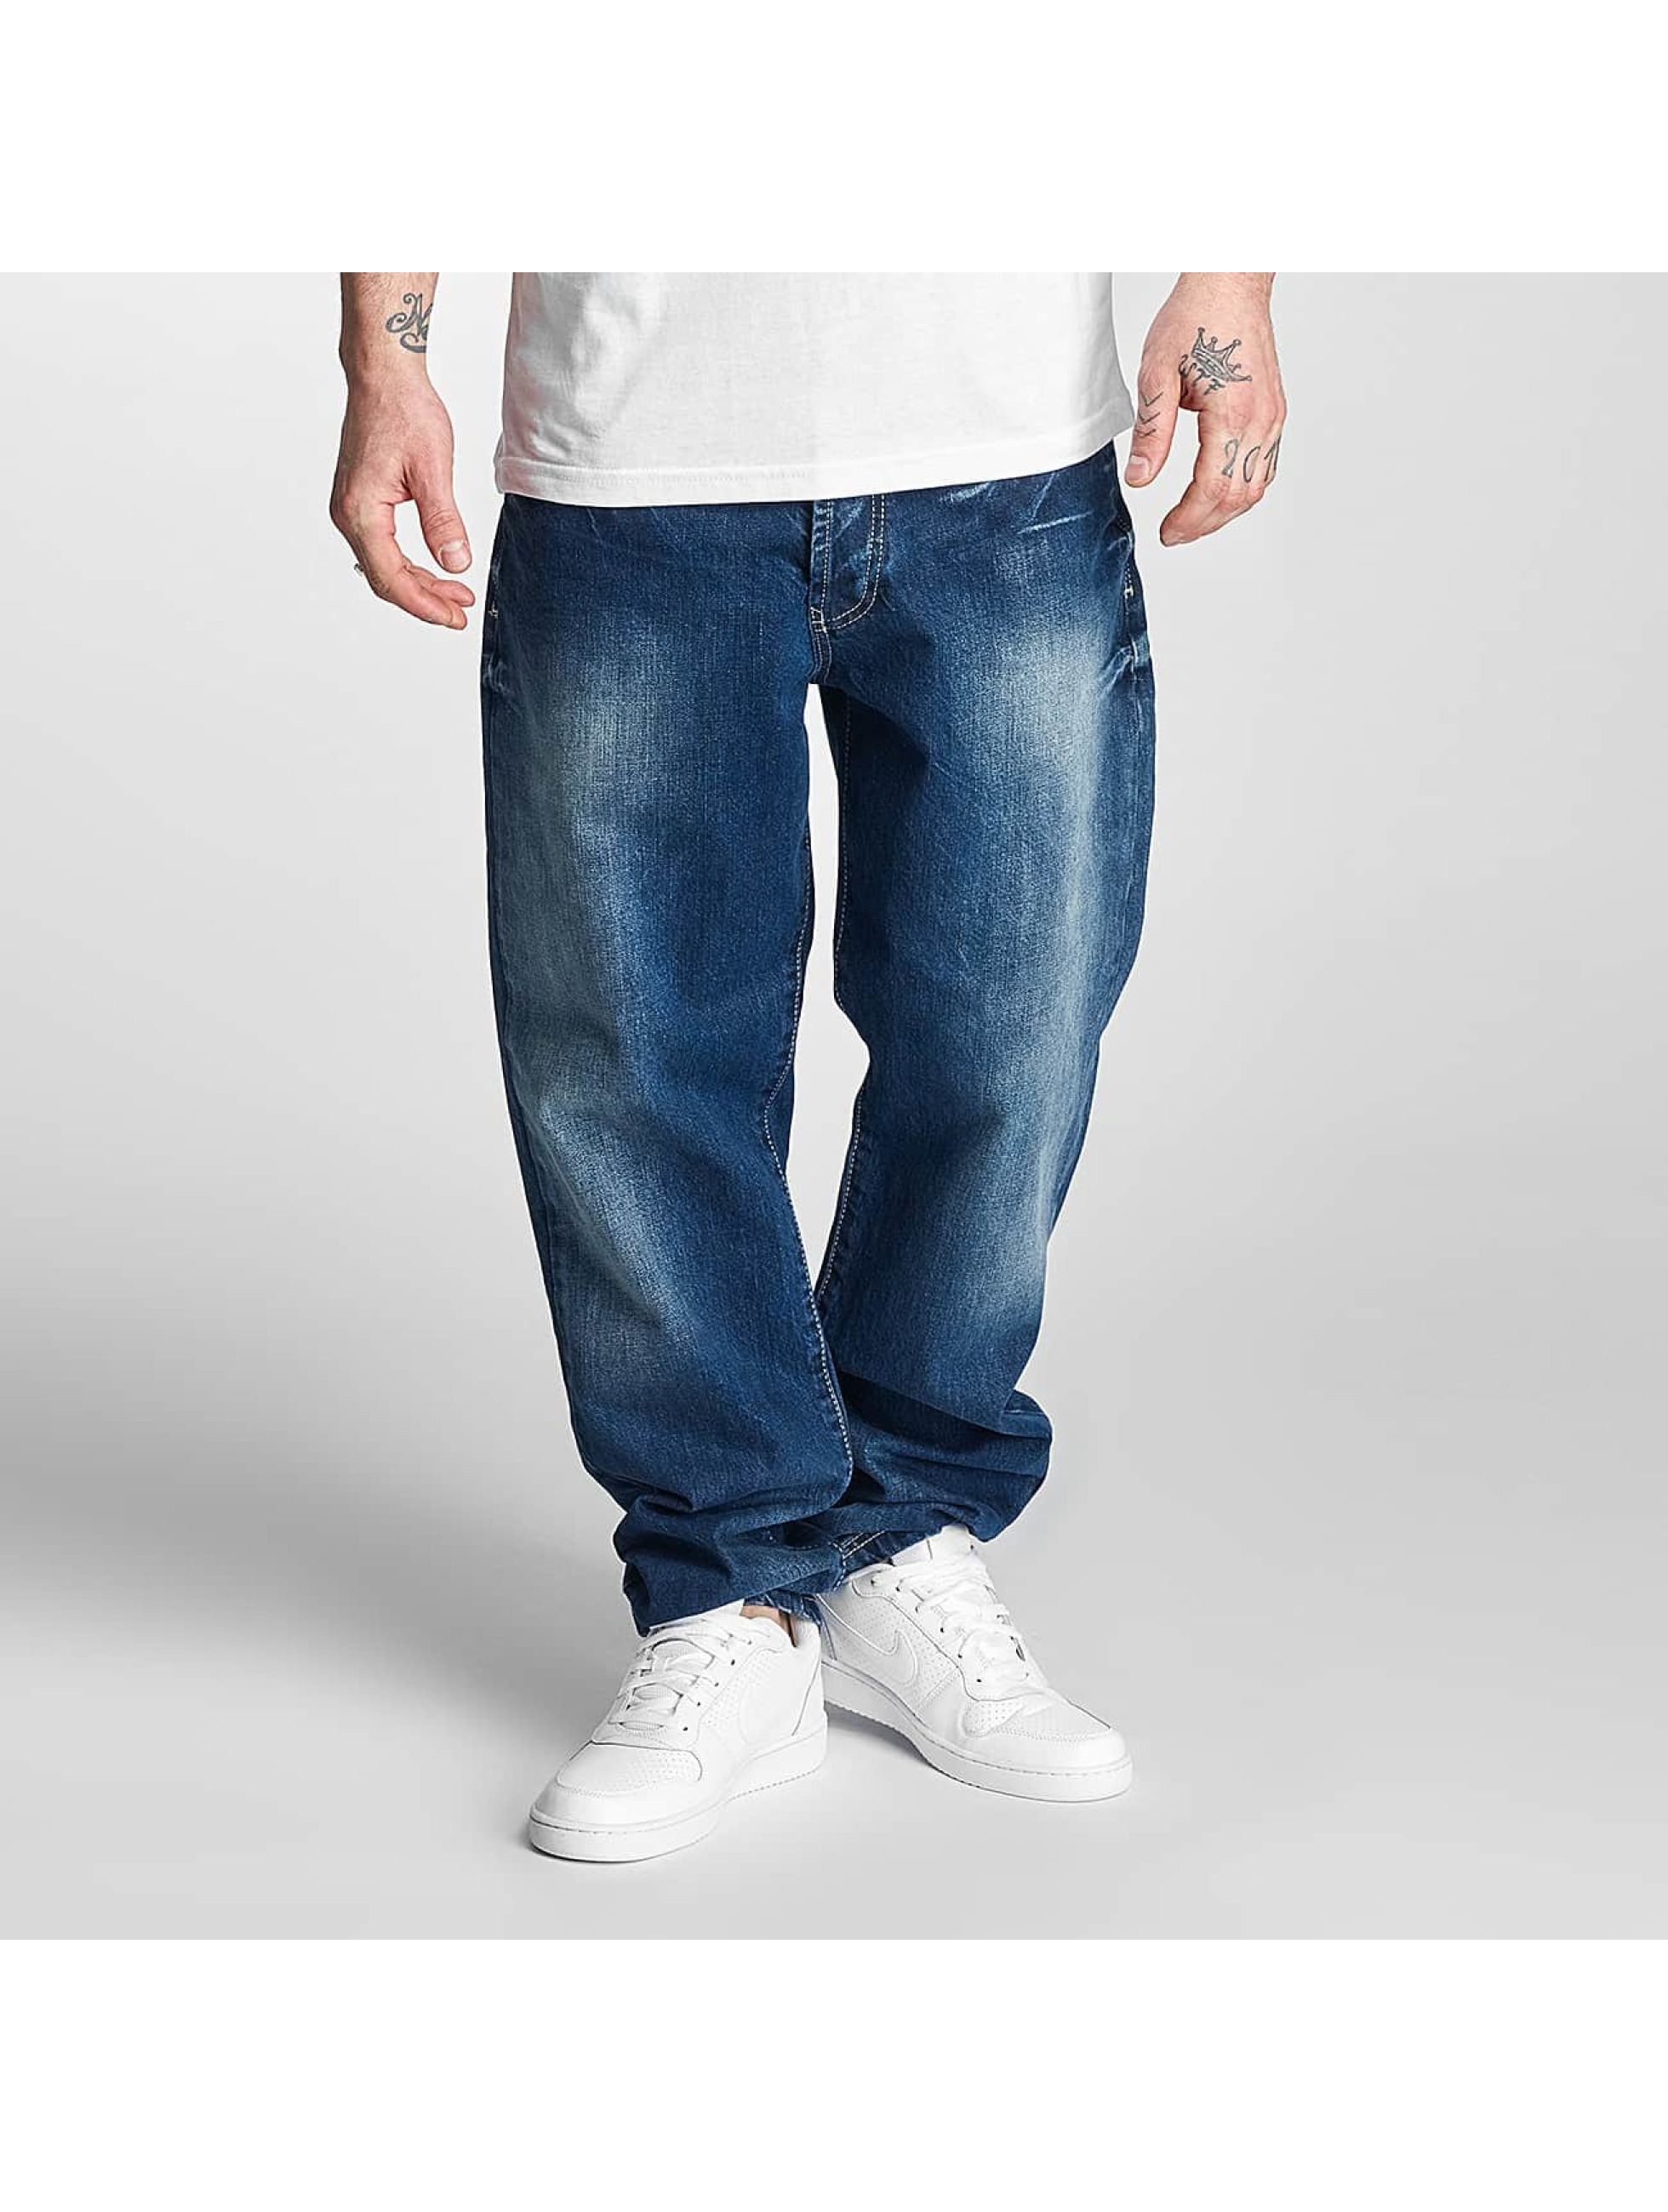 Thug Life Männer Karottenjeans Anadyr in blau